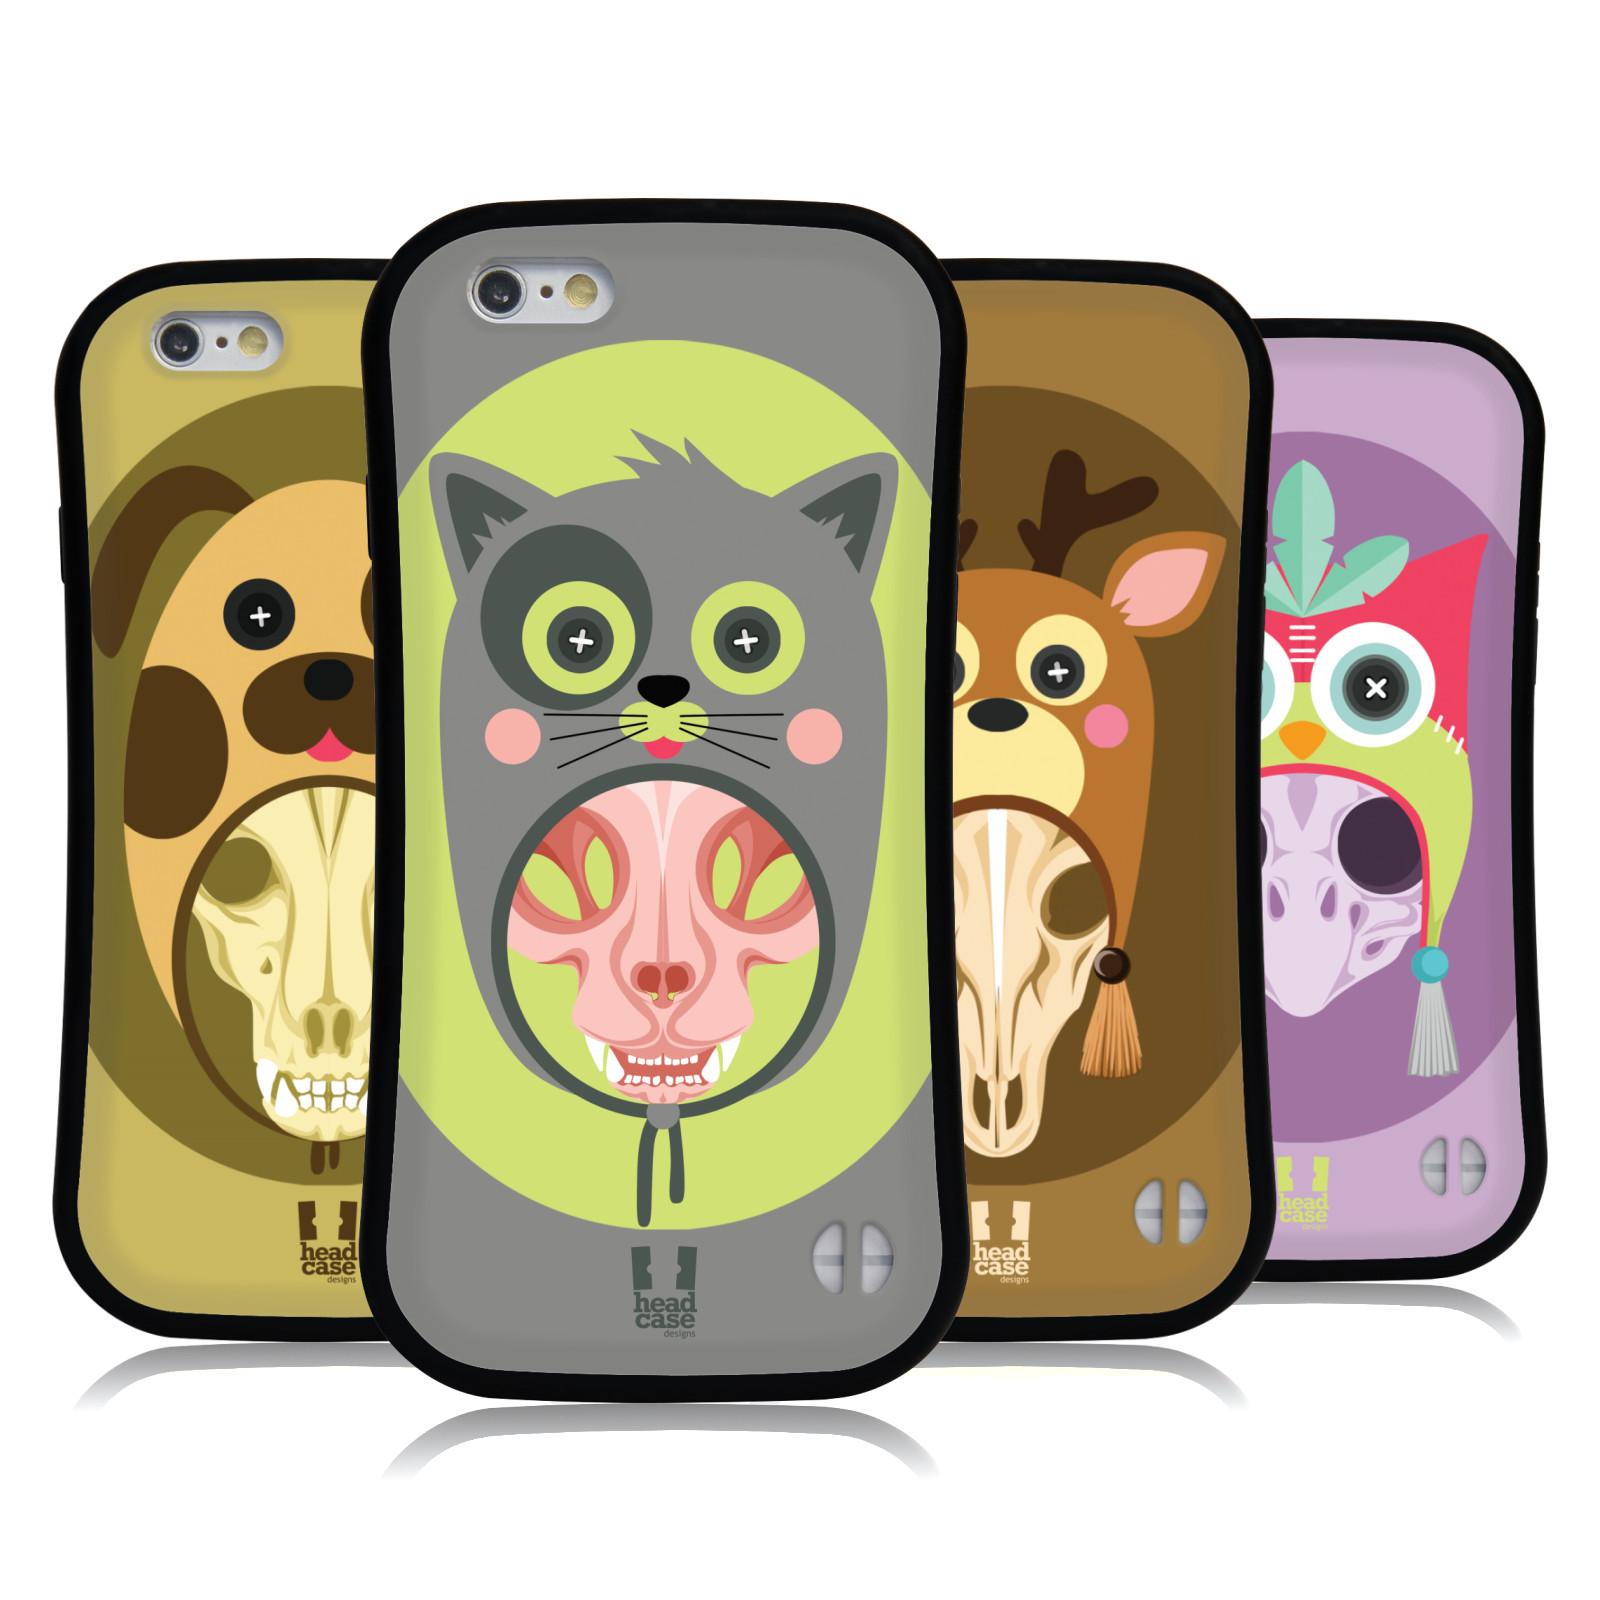 HEAD-CASE-DESIGNS-TIERSCHADEL-MIT-HUTE-HYBRID-HULLE-FUR-APPLE-iPHONES-HANDYS